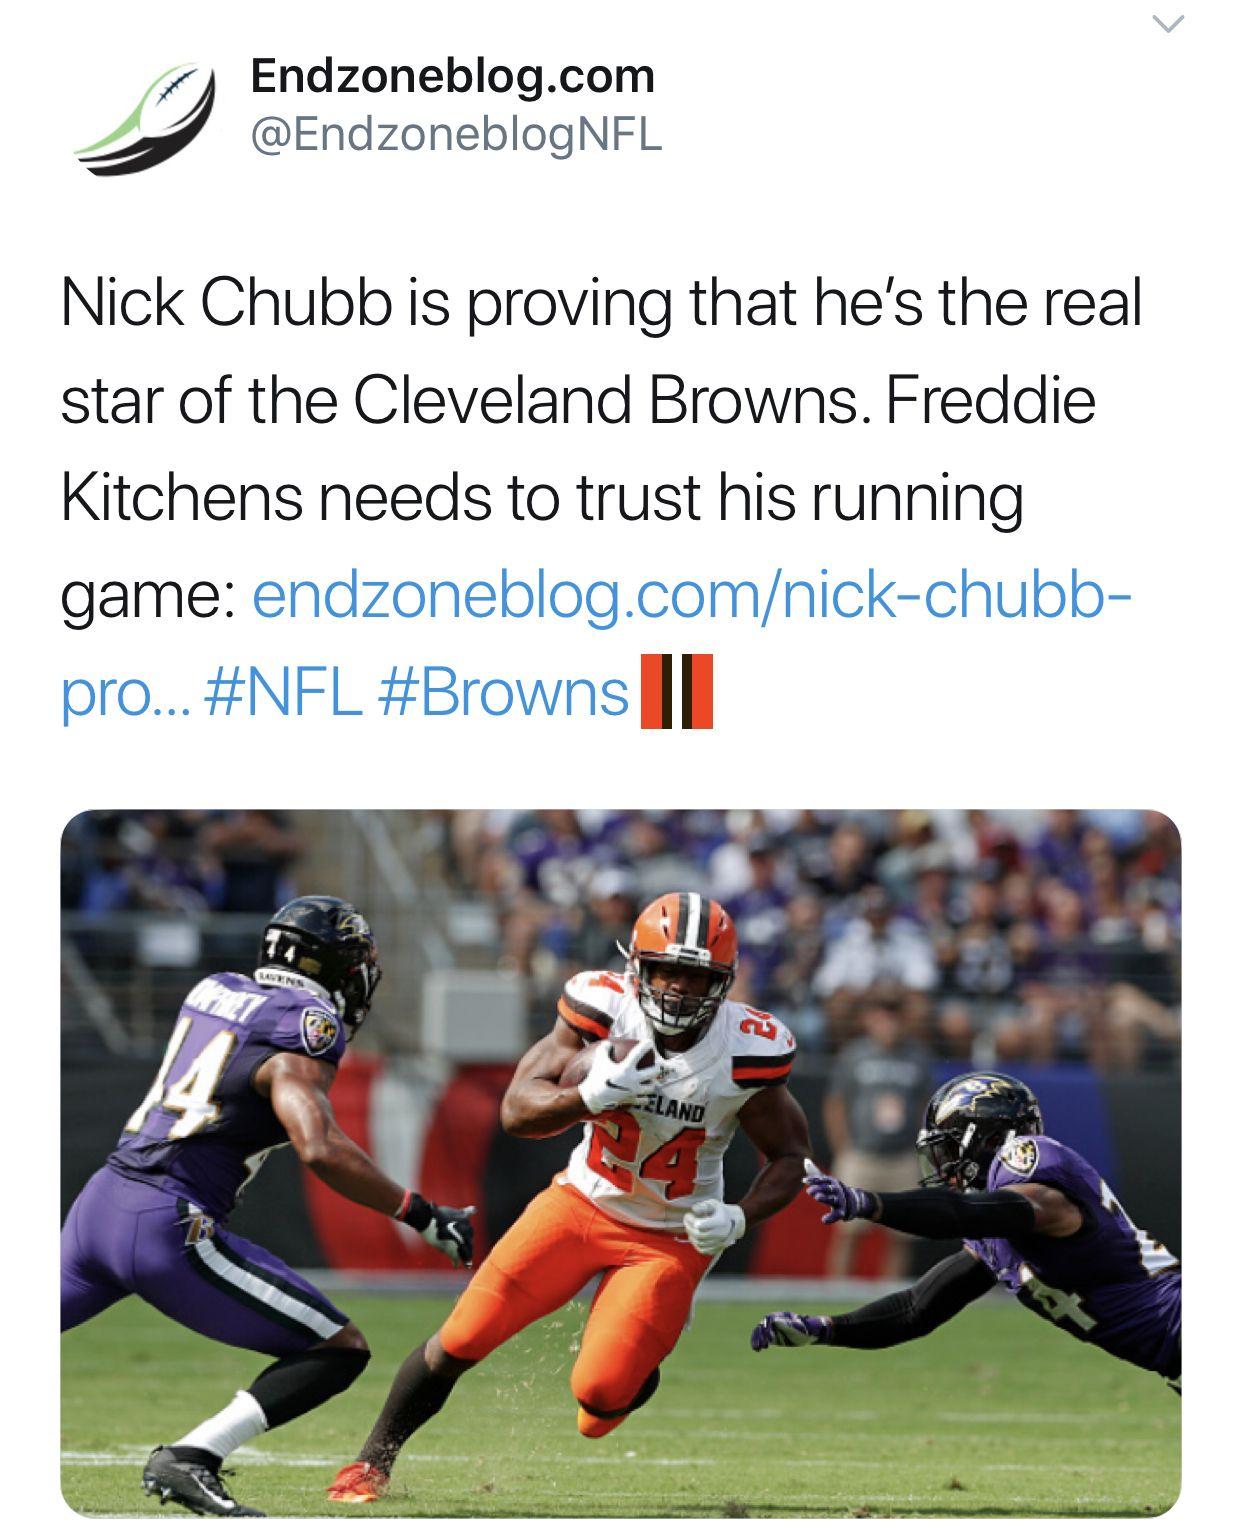 Freddie Kitchens needs to trust his running game